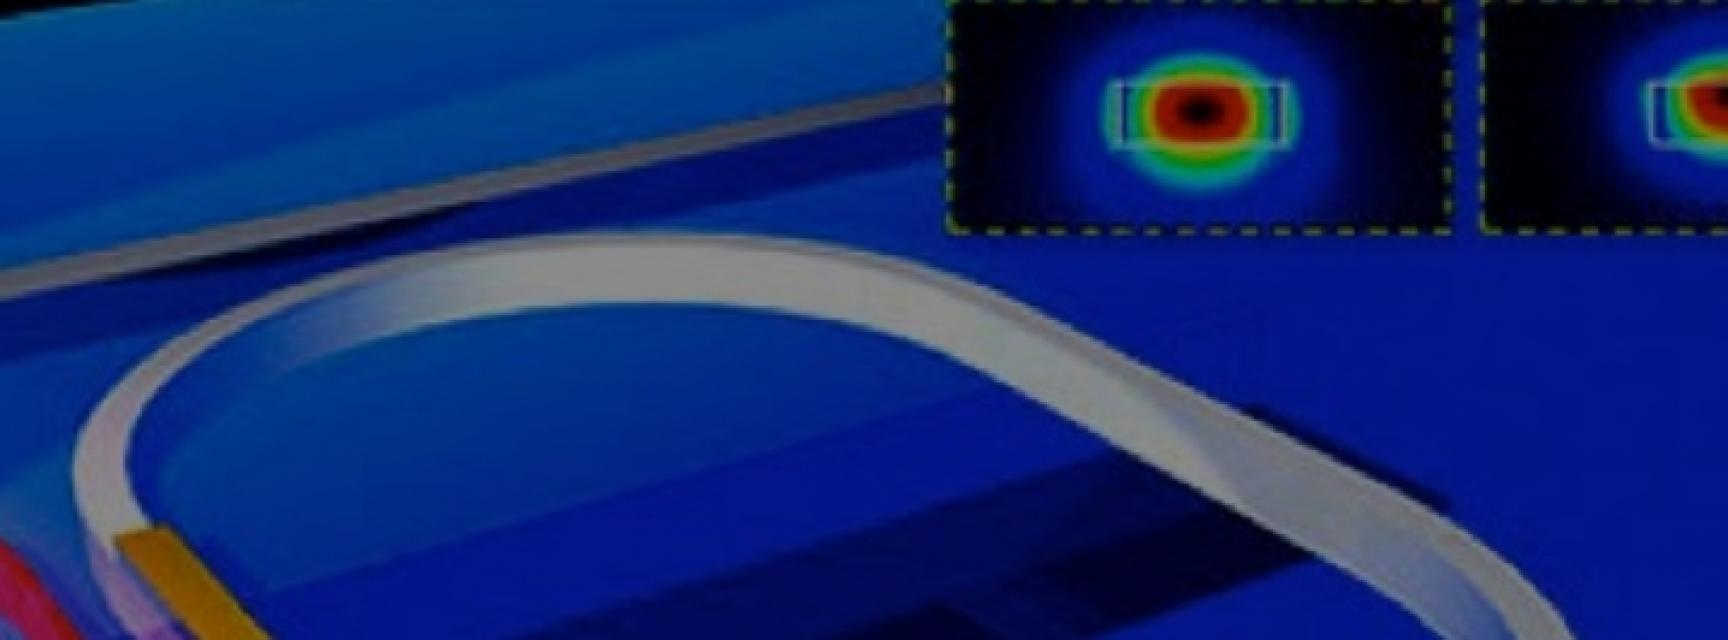 Nanoscale Devices